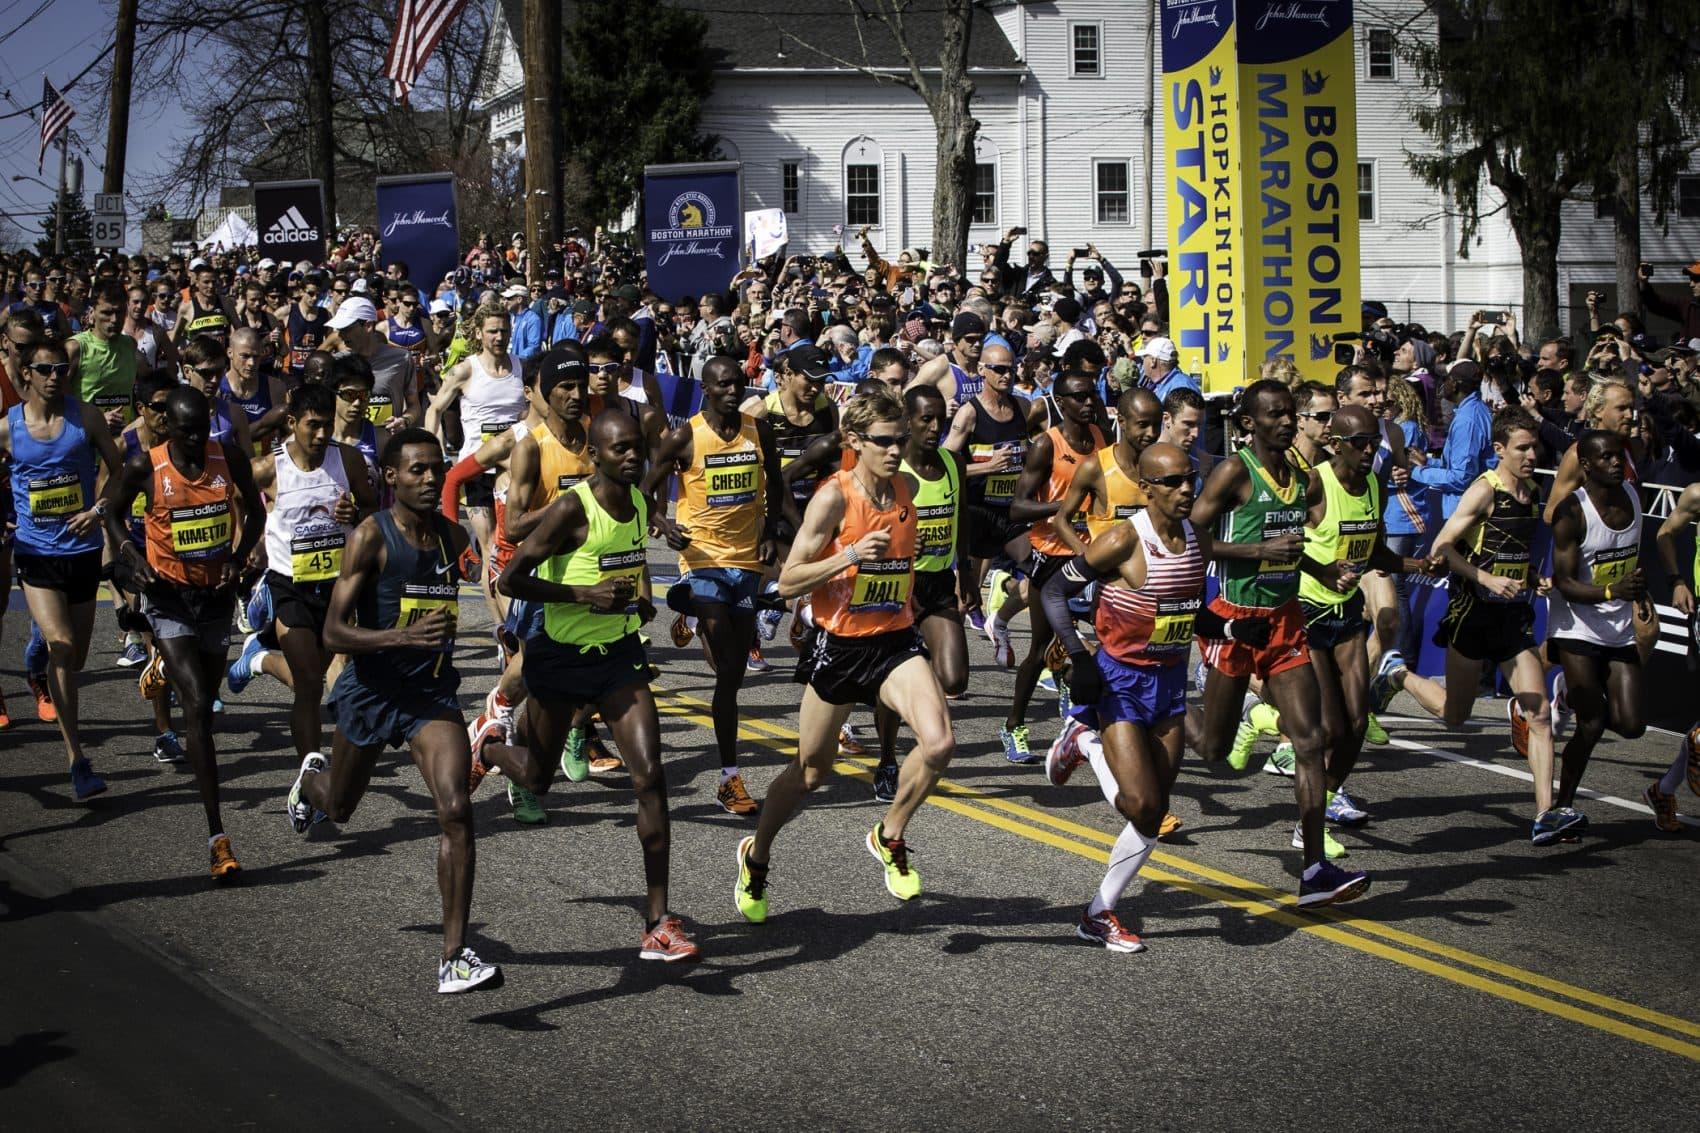 The men's start of the 2014 Boston Marathon on April 21, 2014 in Hopkinton. (Courtesy Michael J. Lutch)